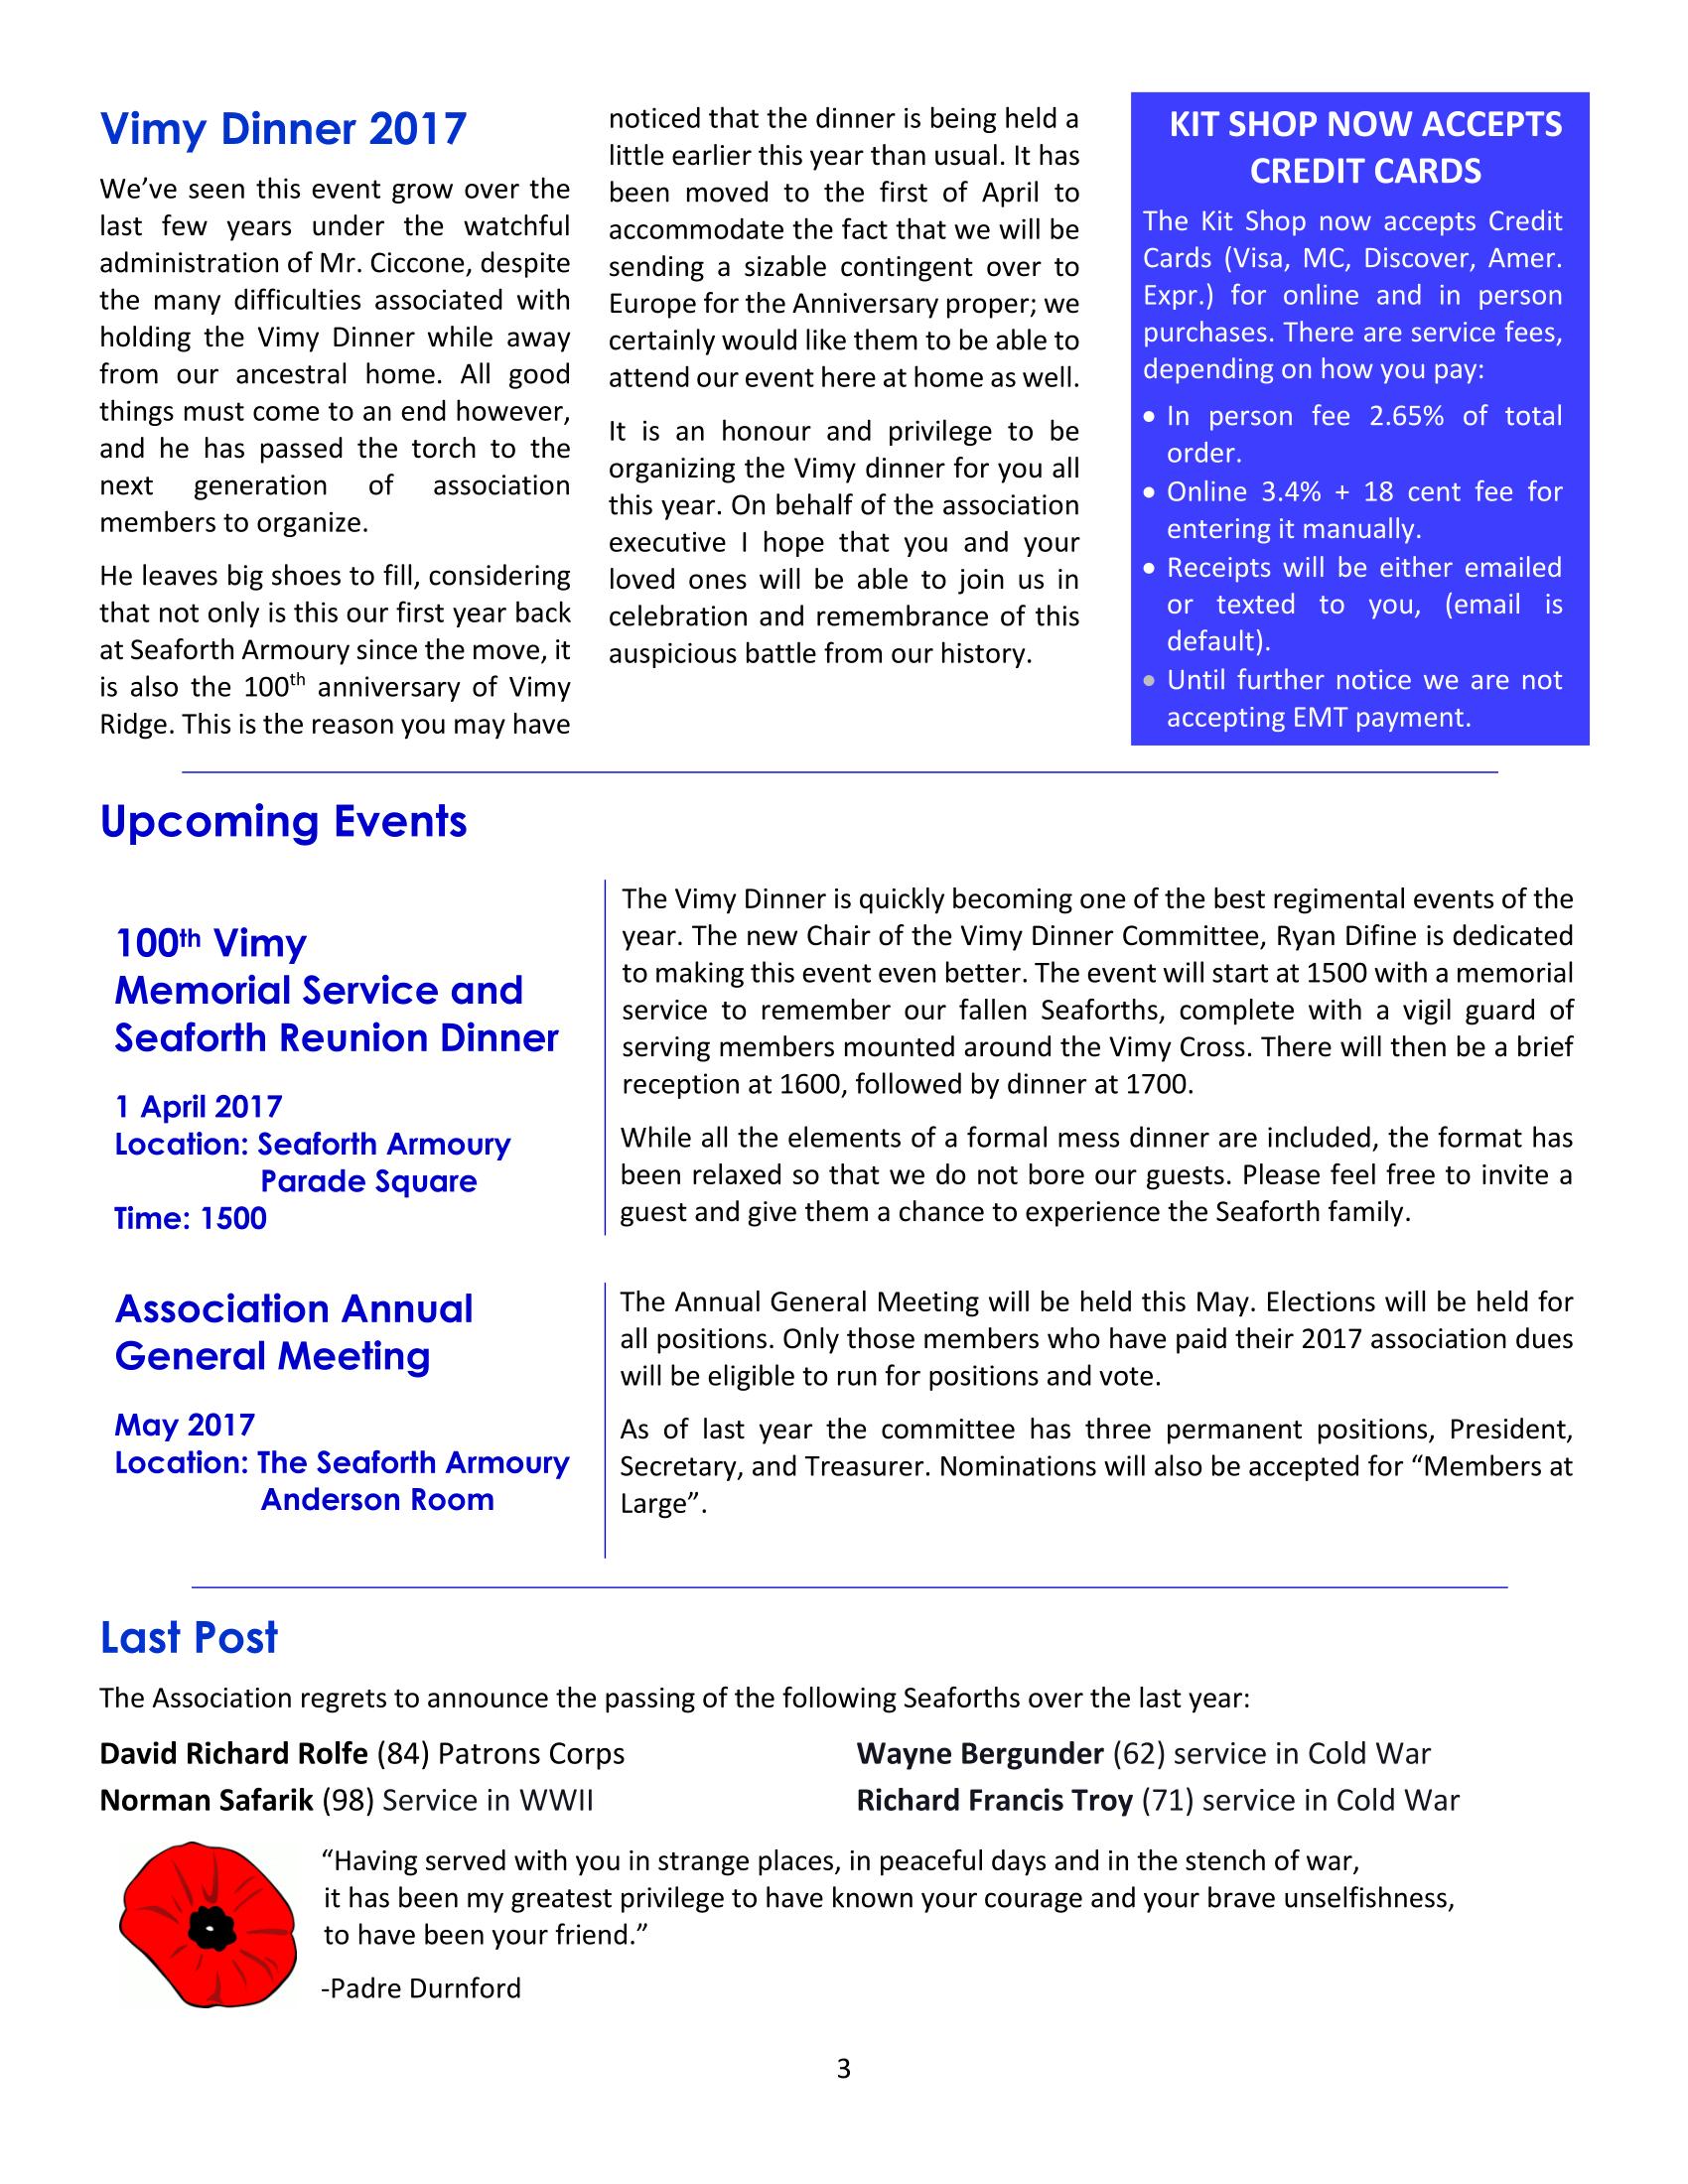 Association Newsletter January 2017-3.png